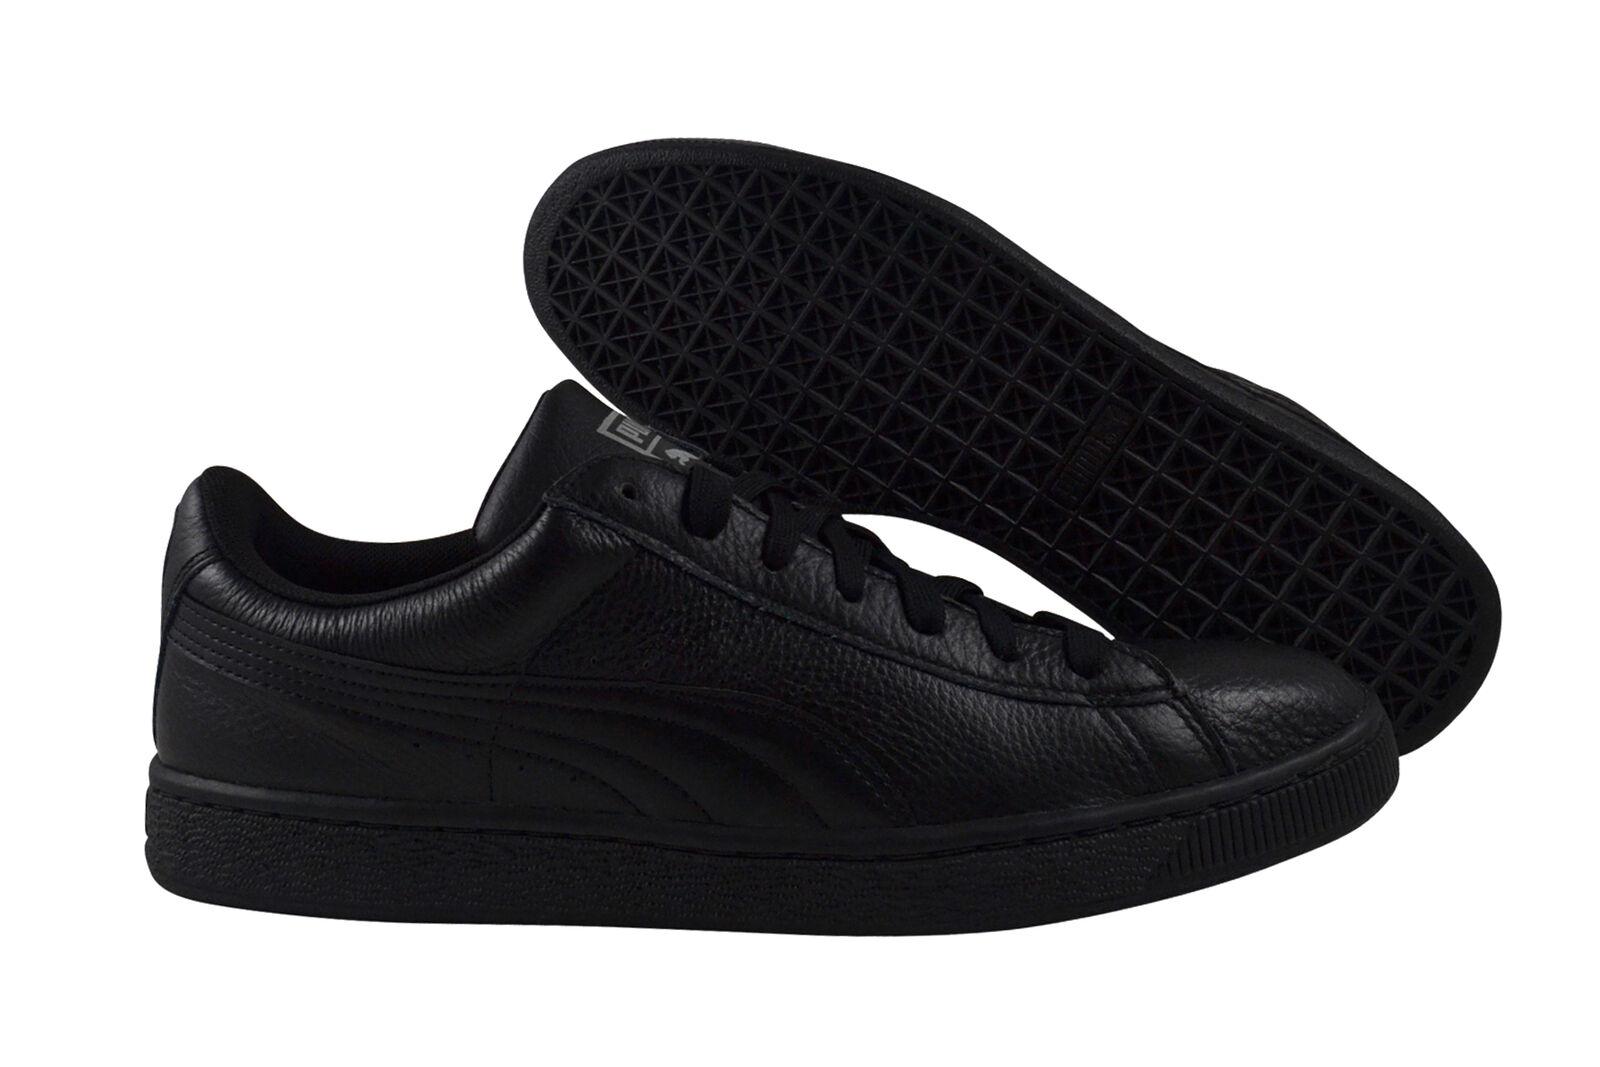 Puma Basket Classic Reflective black silver Sneaker Schuhe schwarz 360147 02